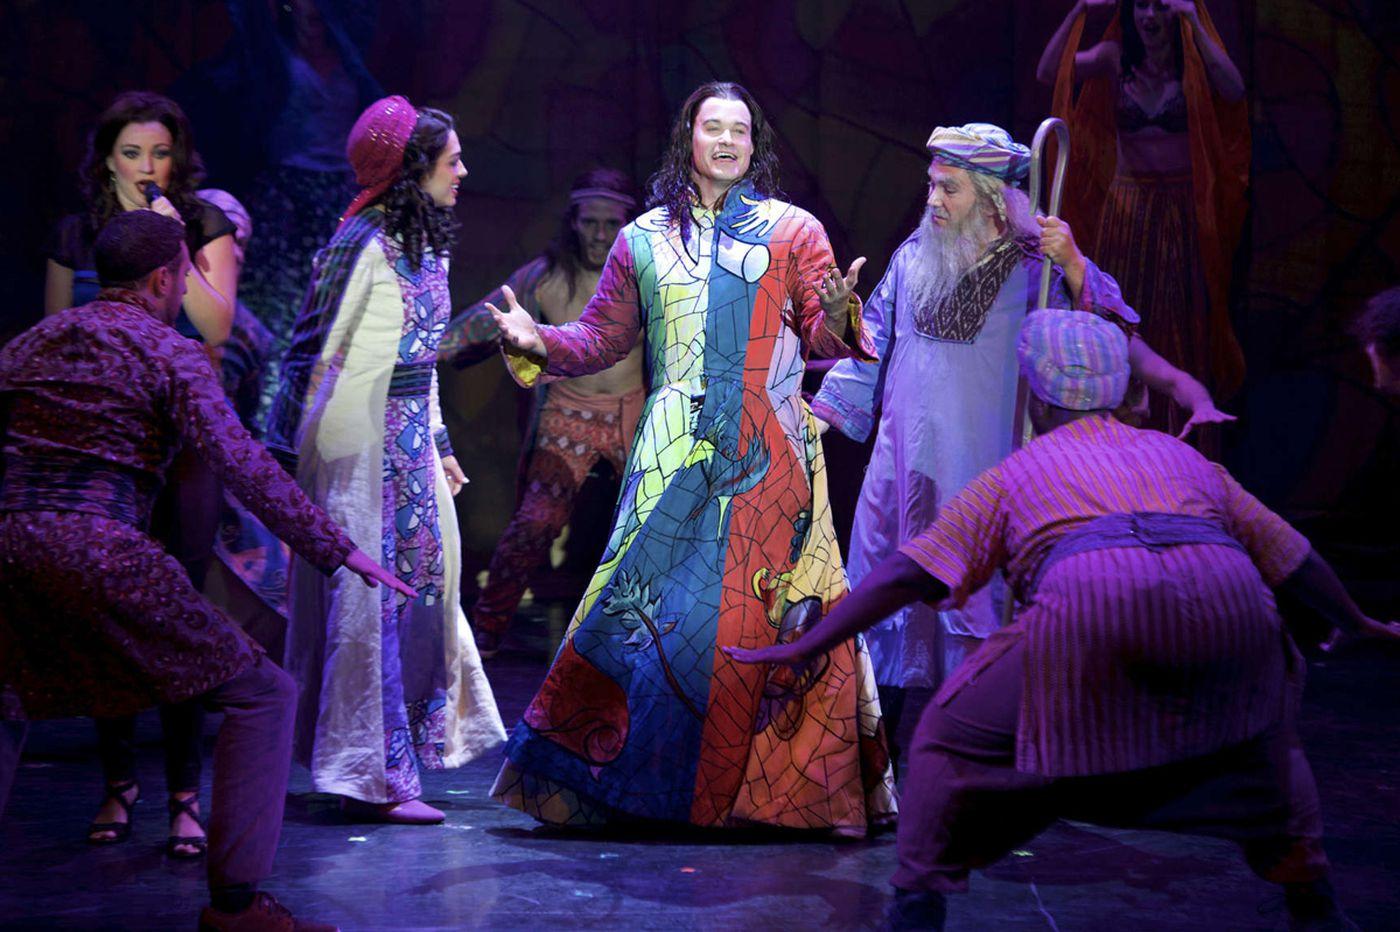 Joseph rocks his 'Dreamcoat' at Merriam Theater